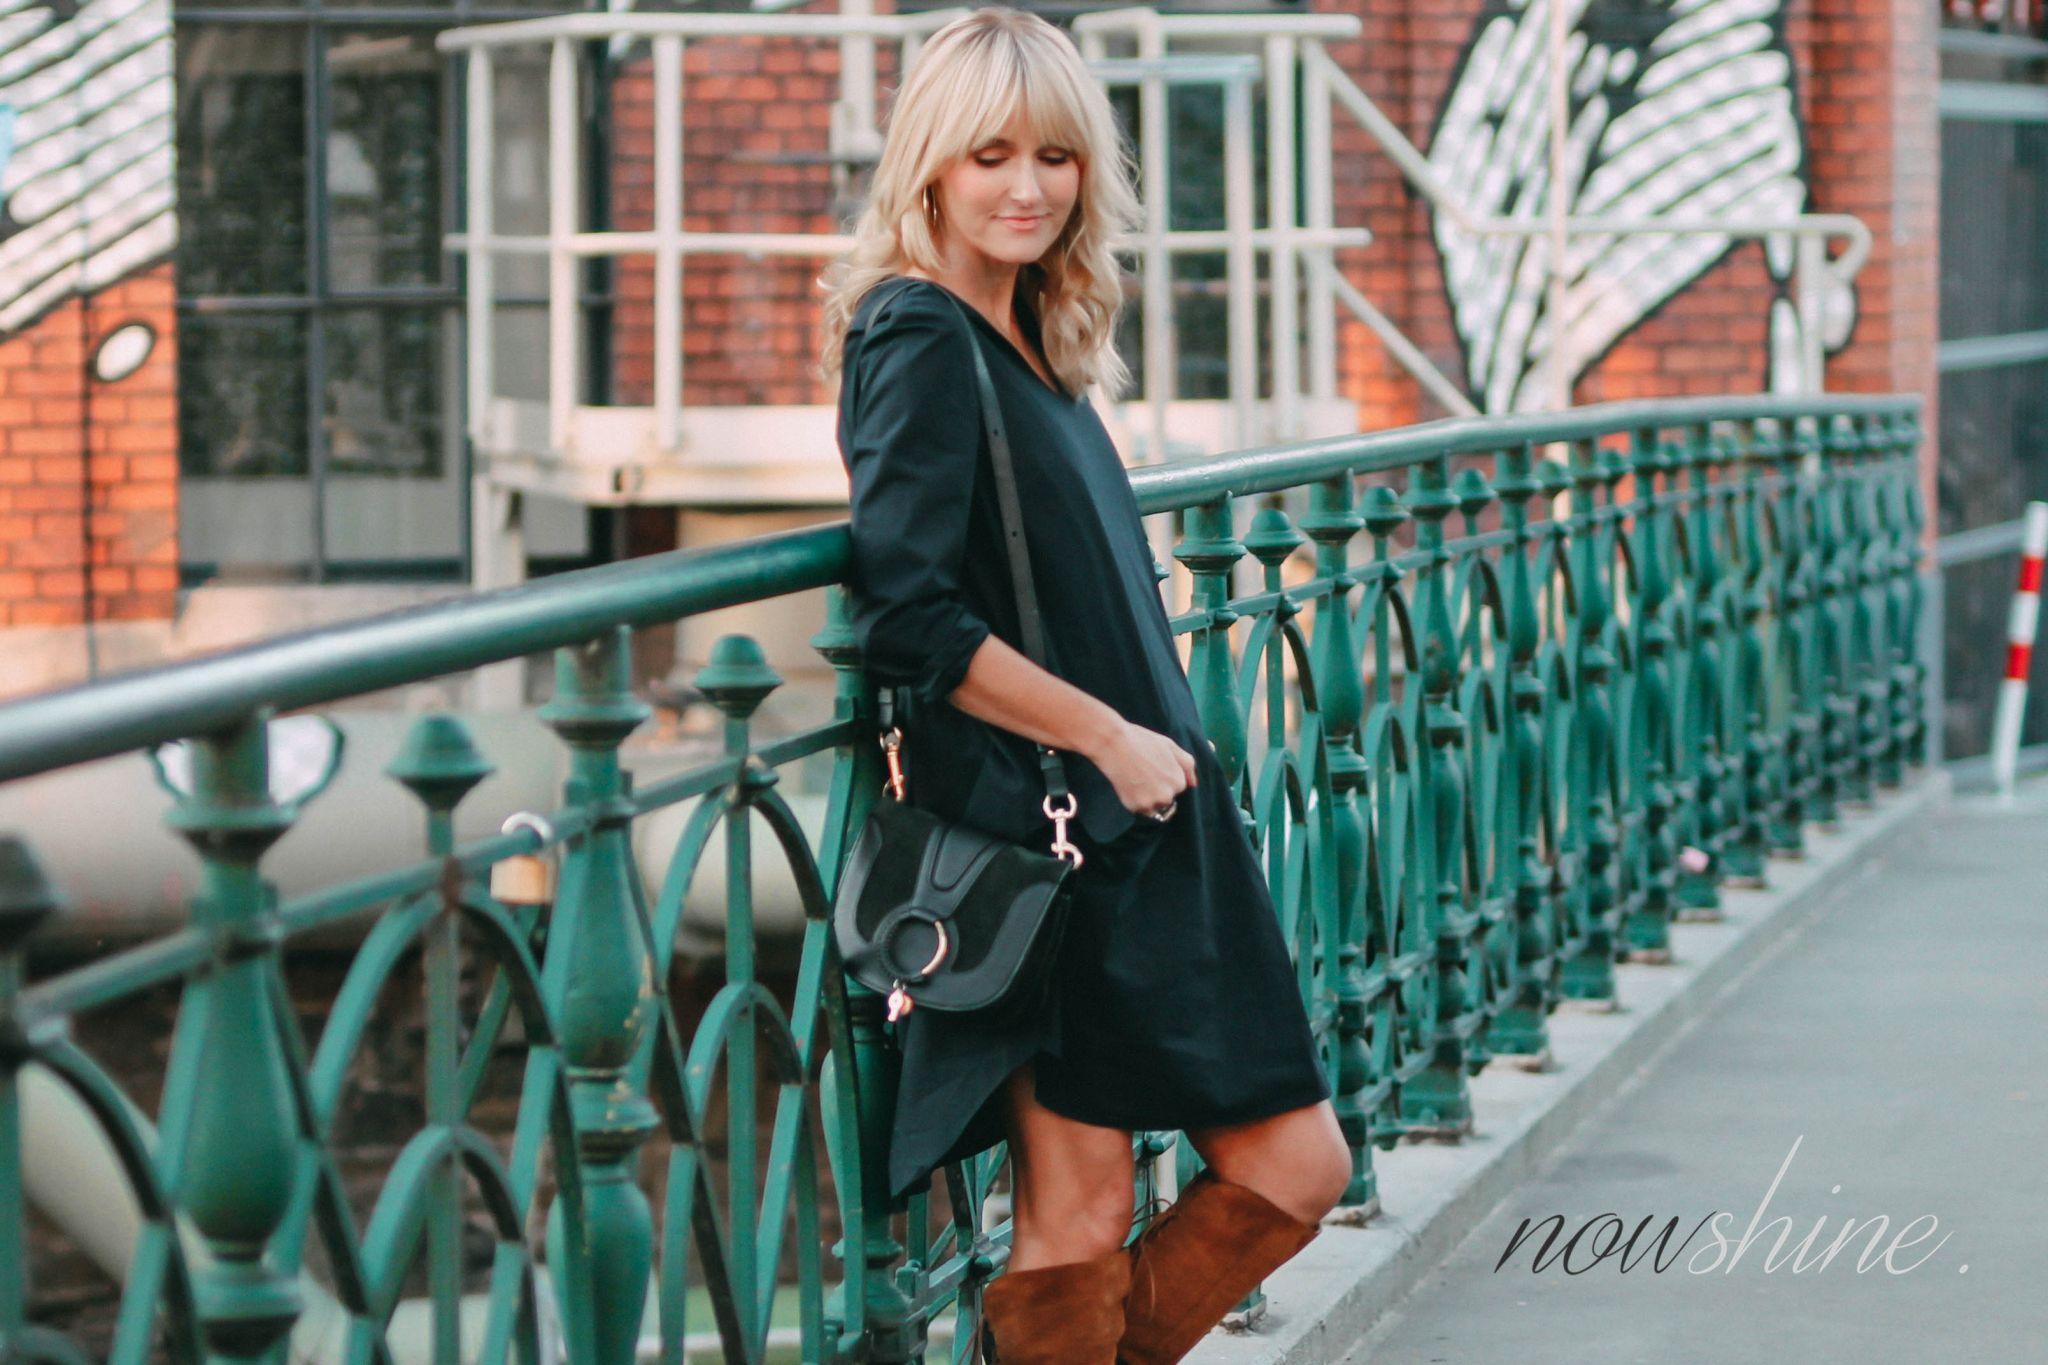 COS Kleid in Navy - Nowshine ü40 Fashionblog